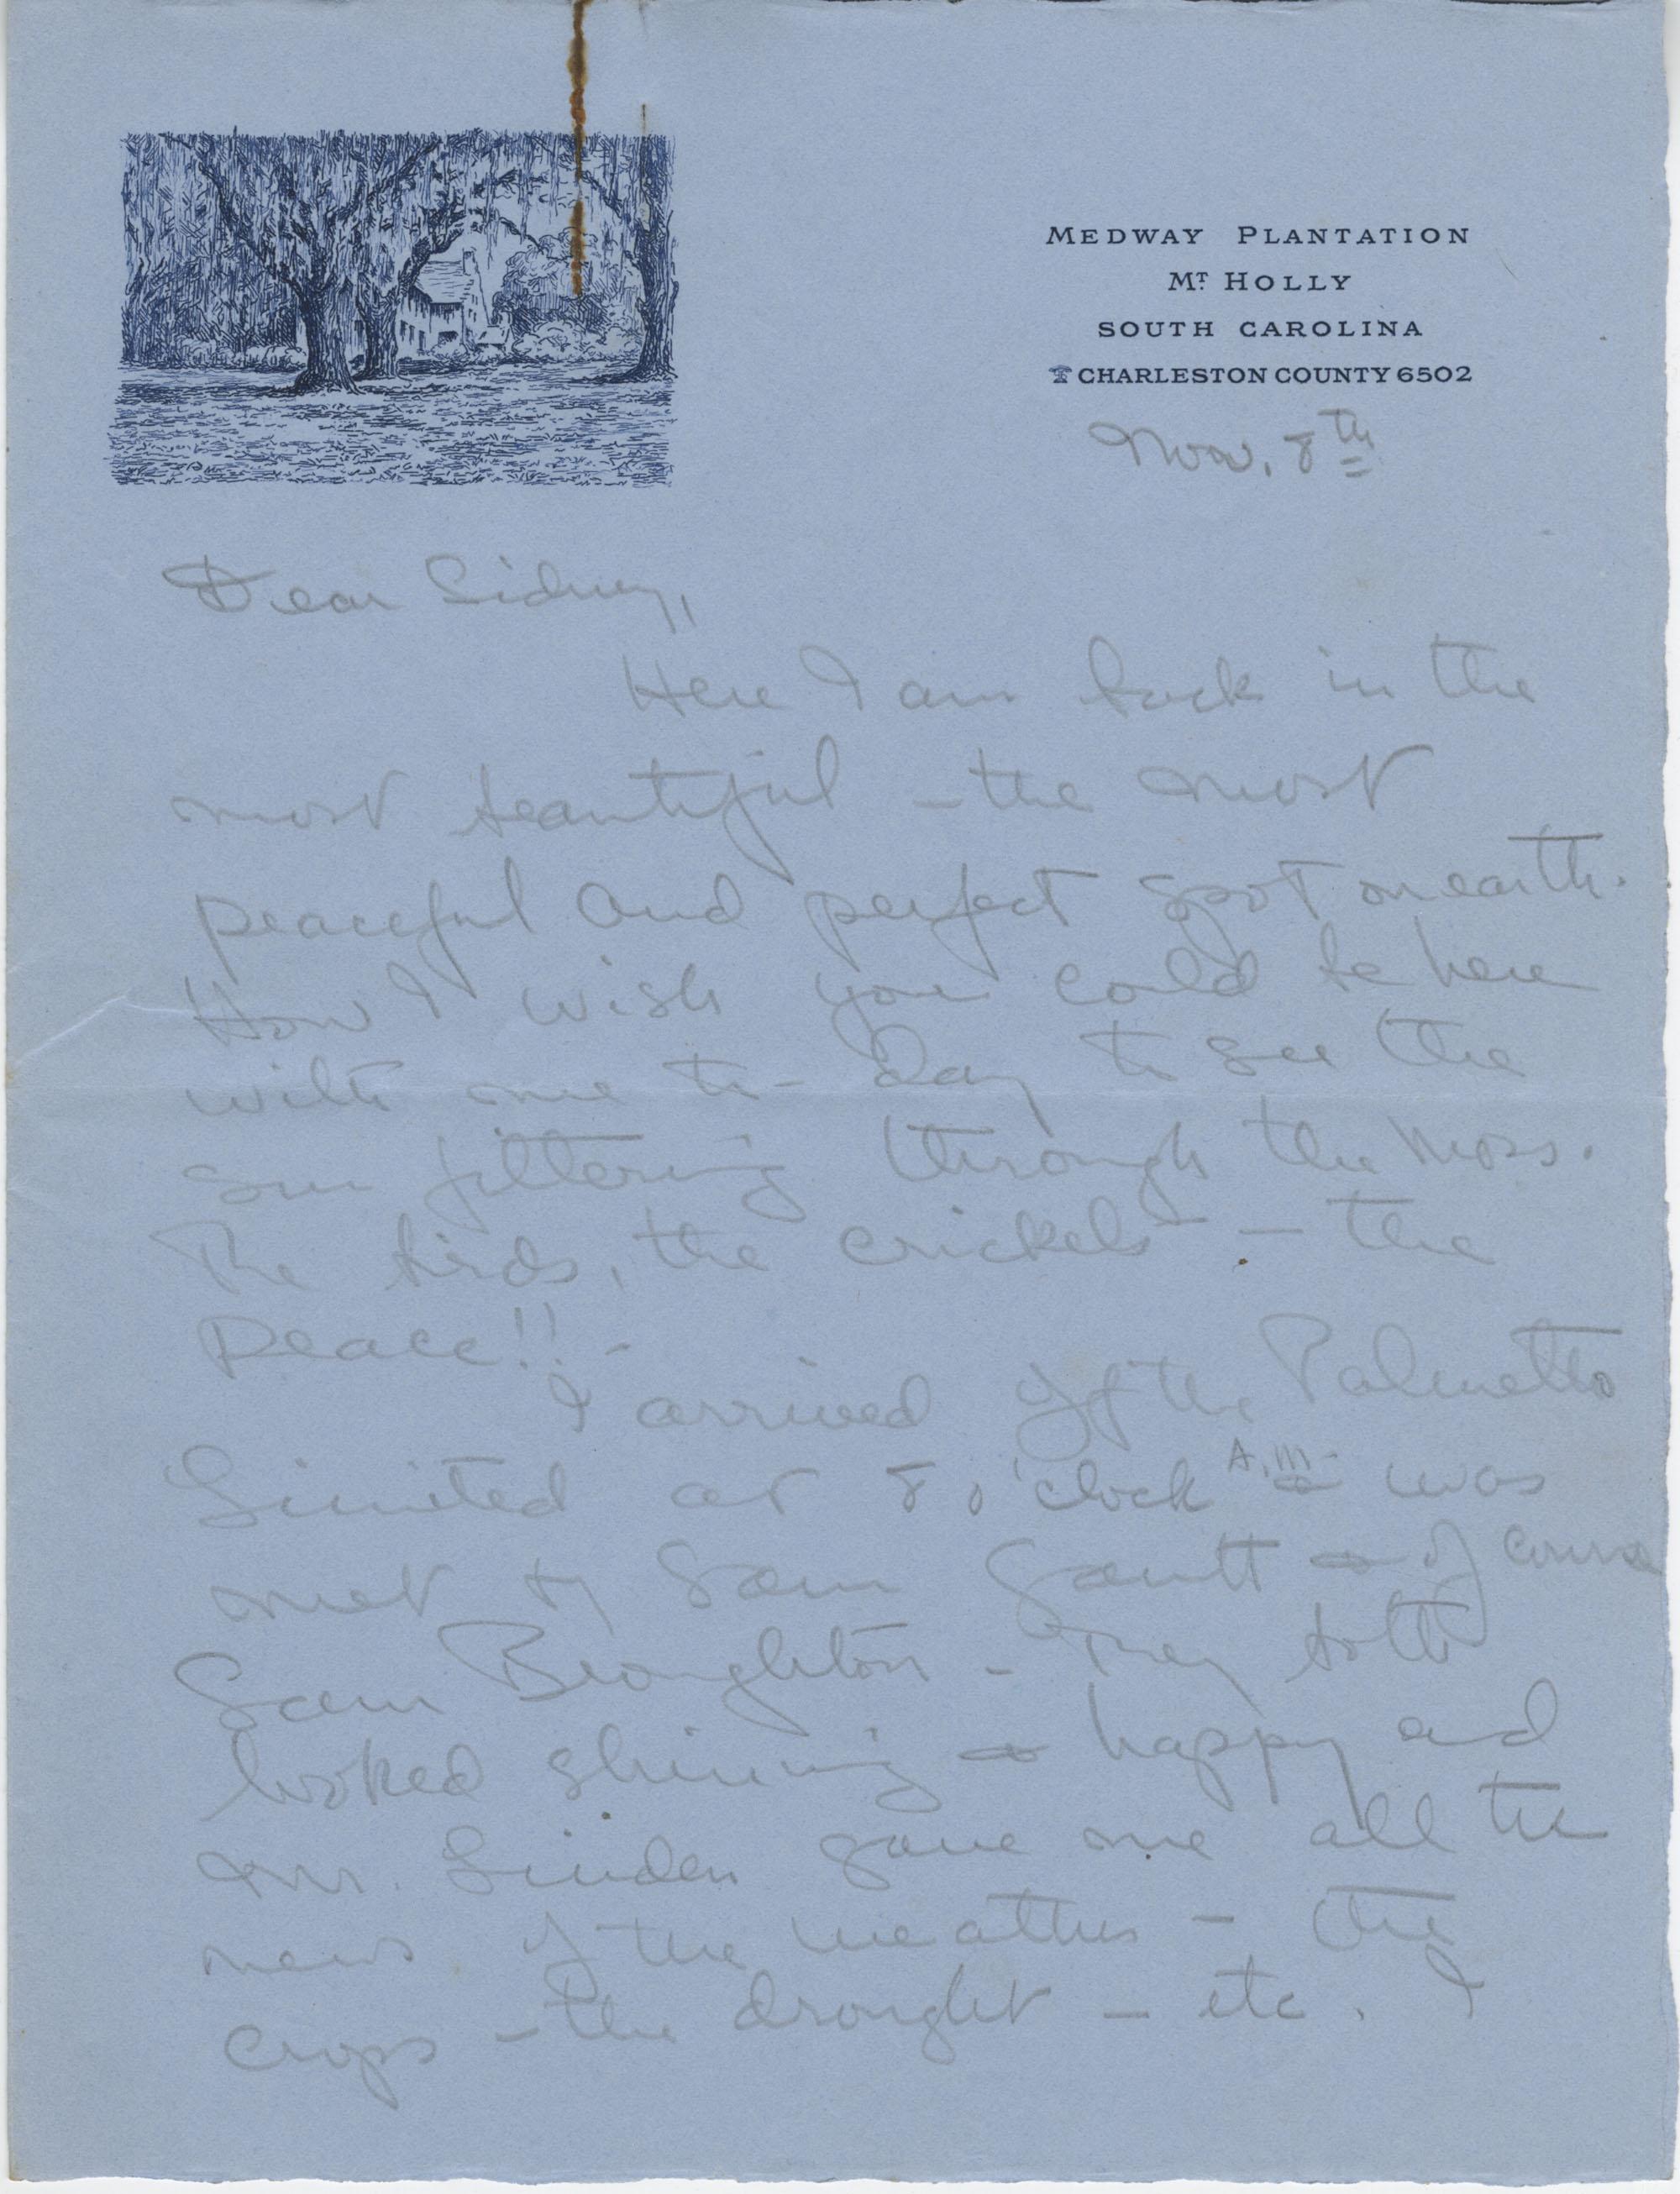 Letter from Gertrude Sanford Legendre, November 8, 1942